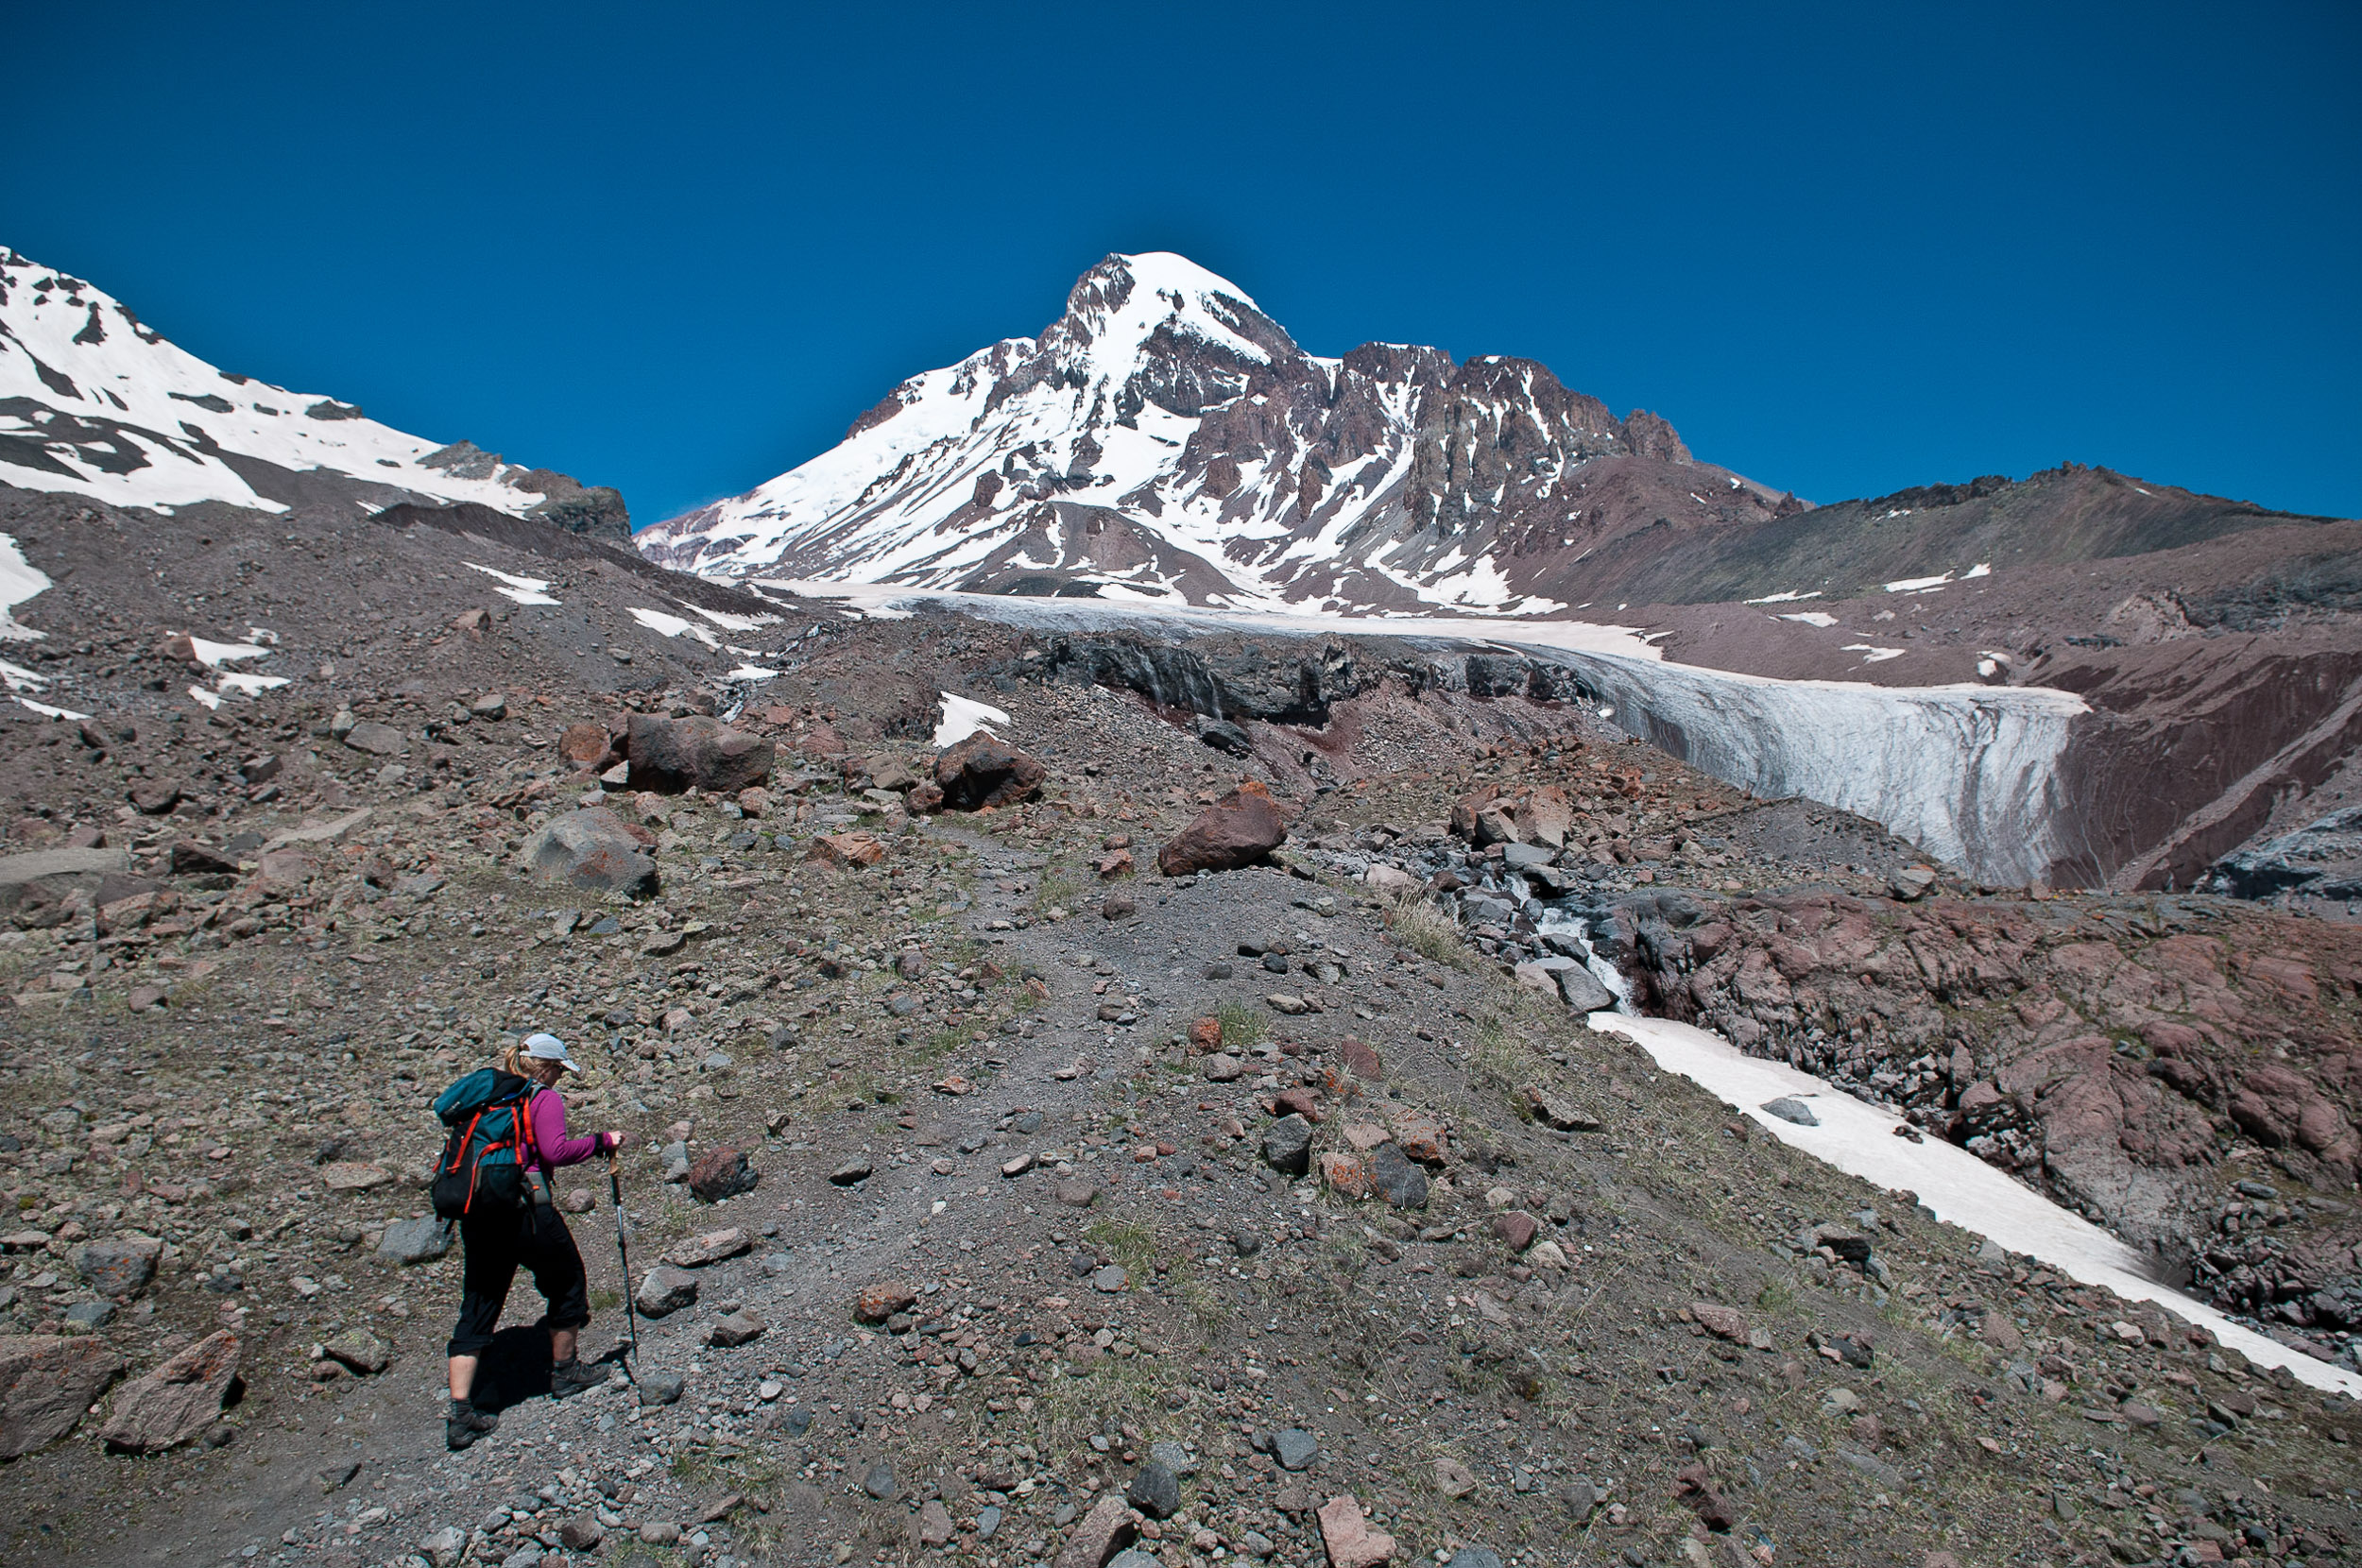 Trekker approaching Kazbegi mountain, Georgia.